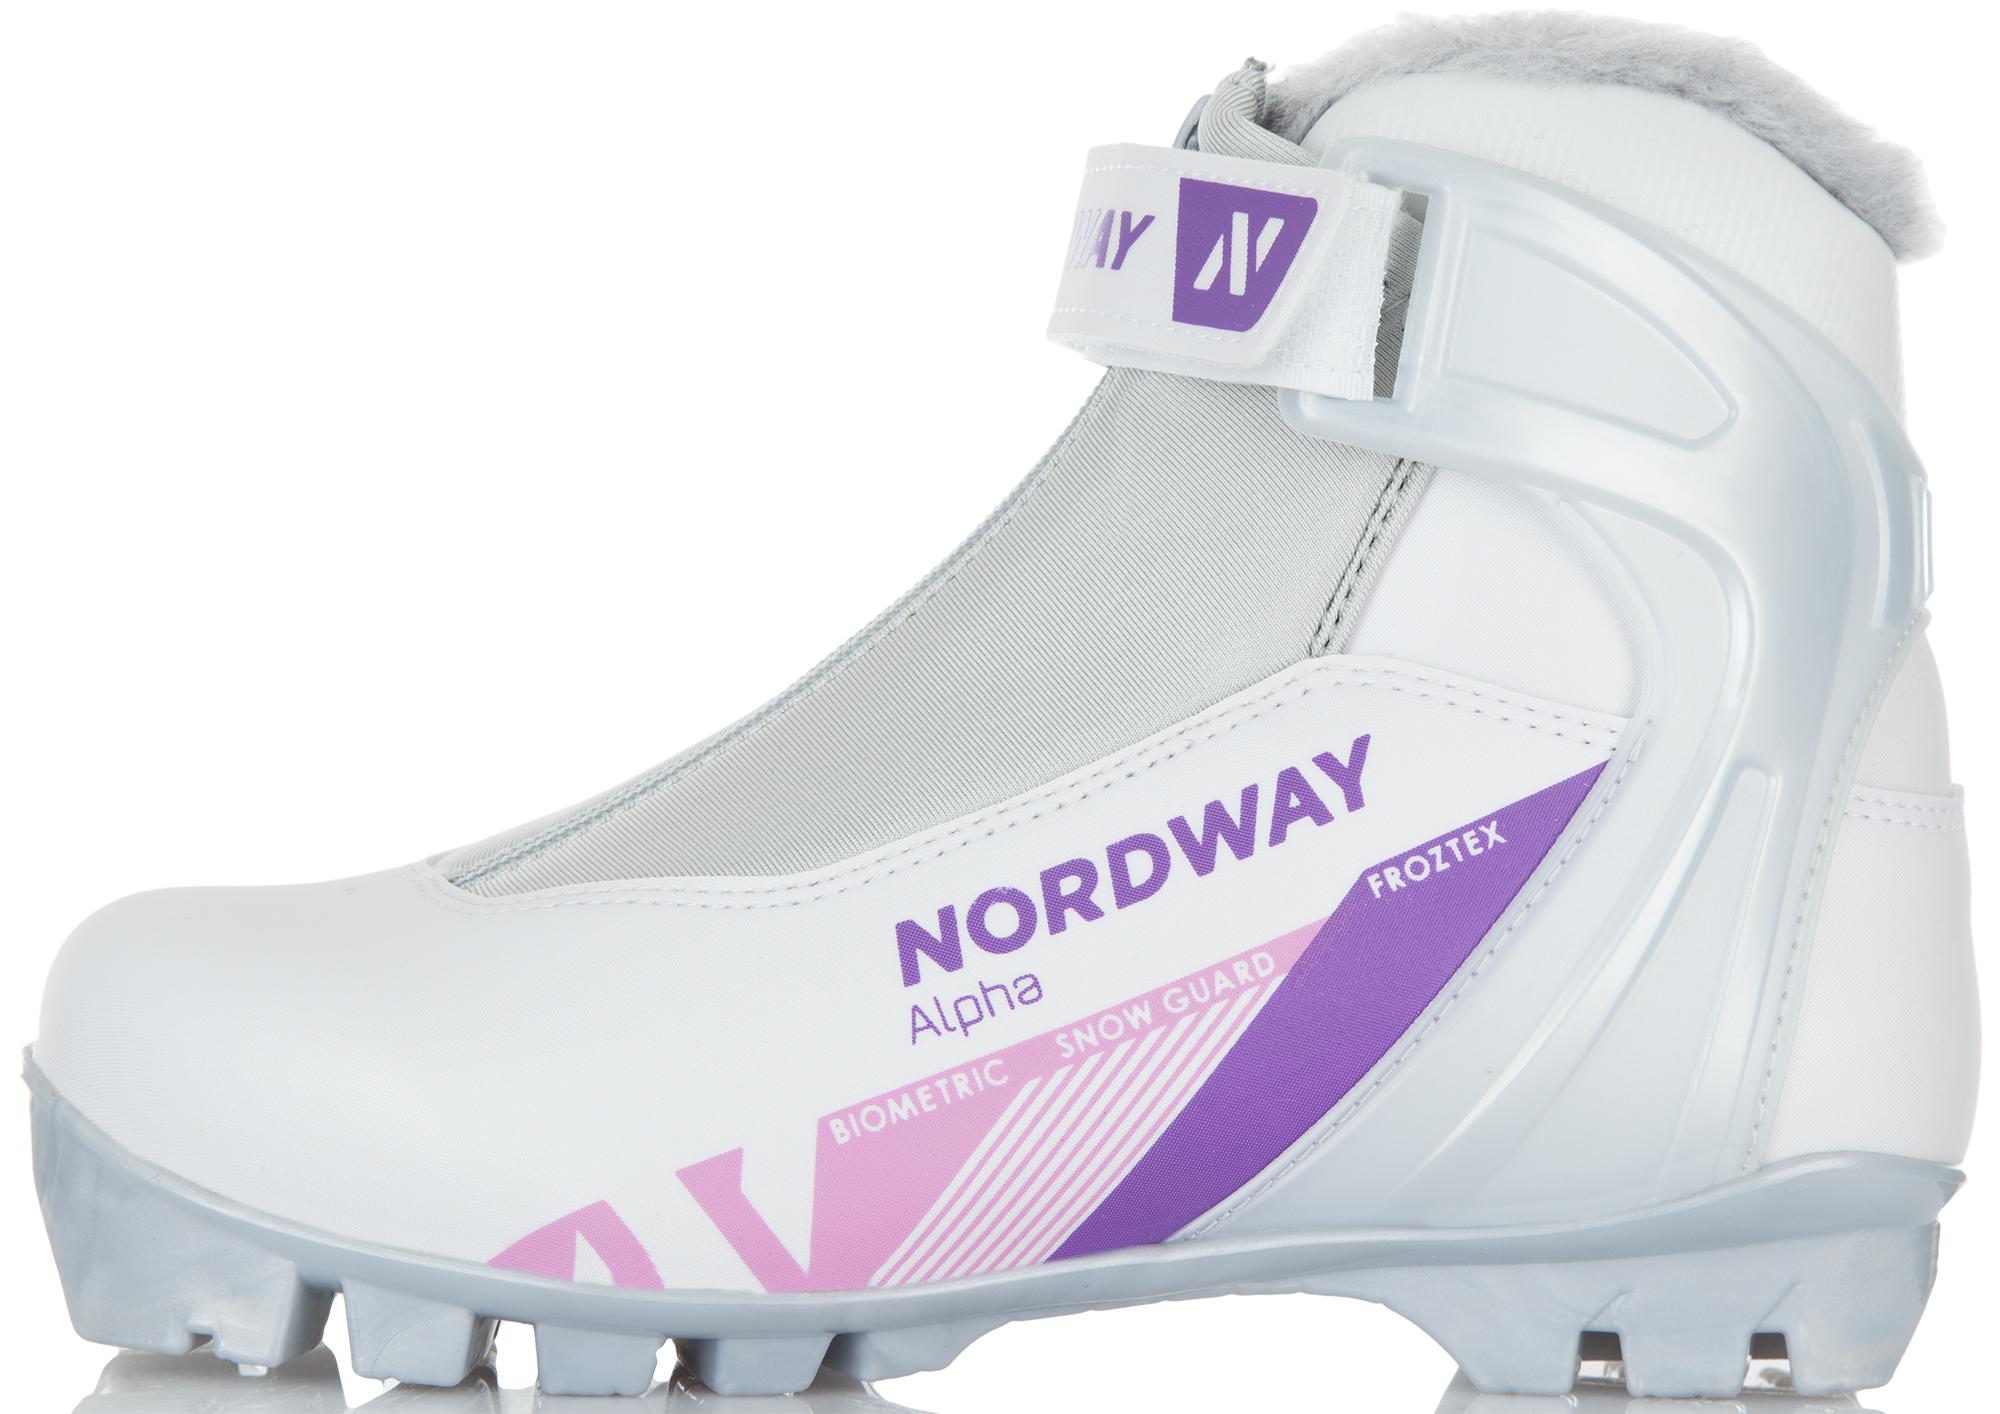 Nordway Ботинки для беговых лыж женские Nordway Alpha nordway крепления для лыж nordway nn 75